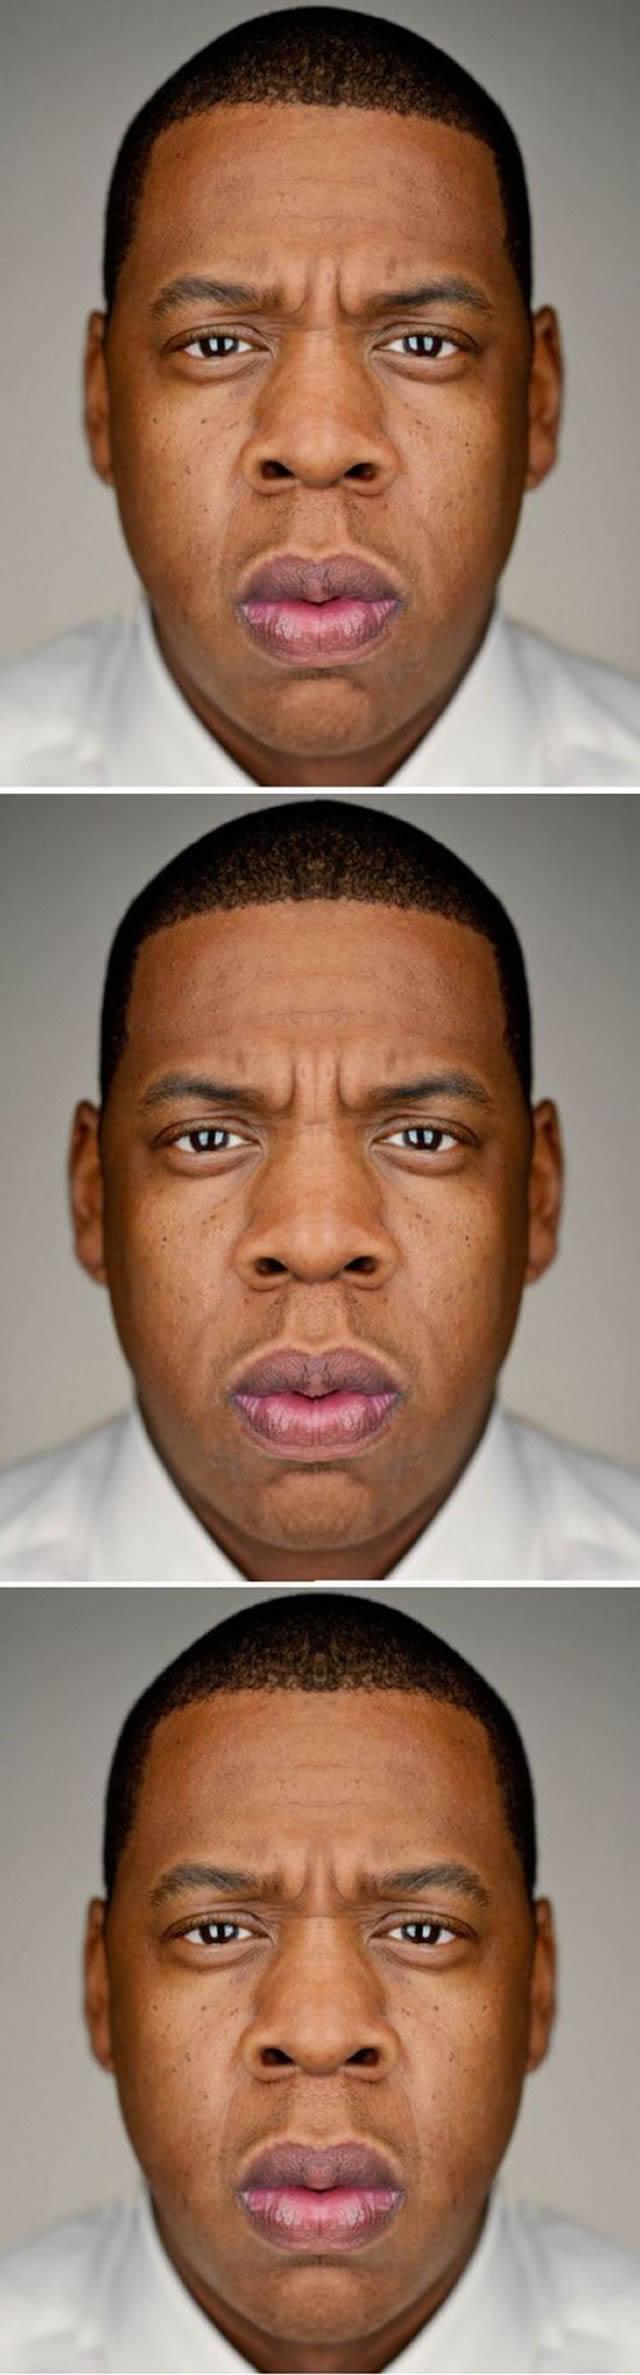 rostros simetricos famosos (13)